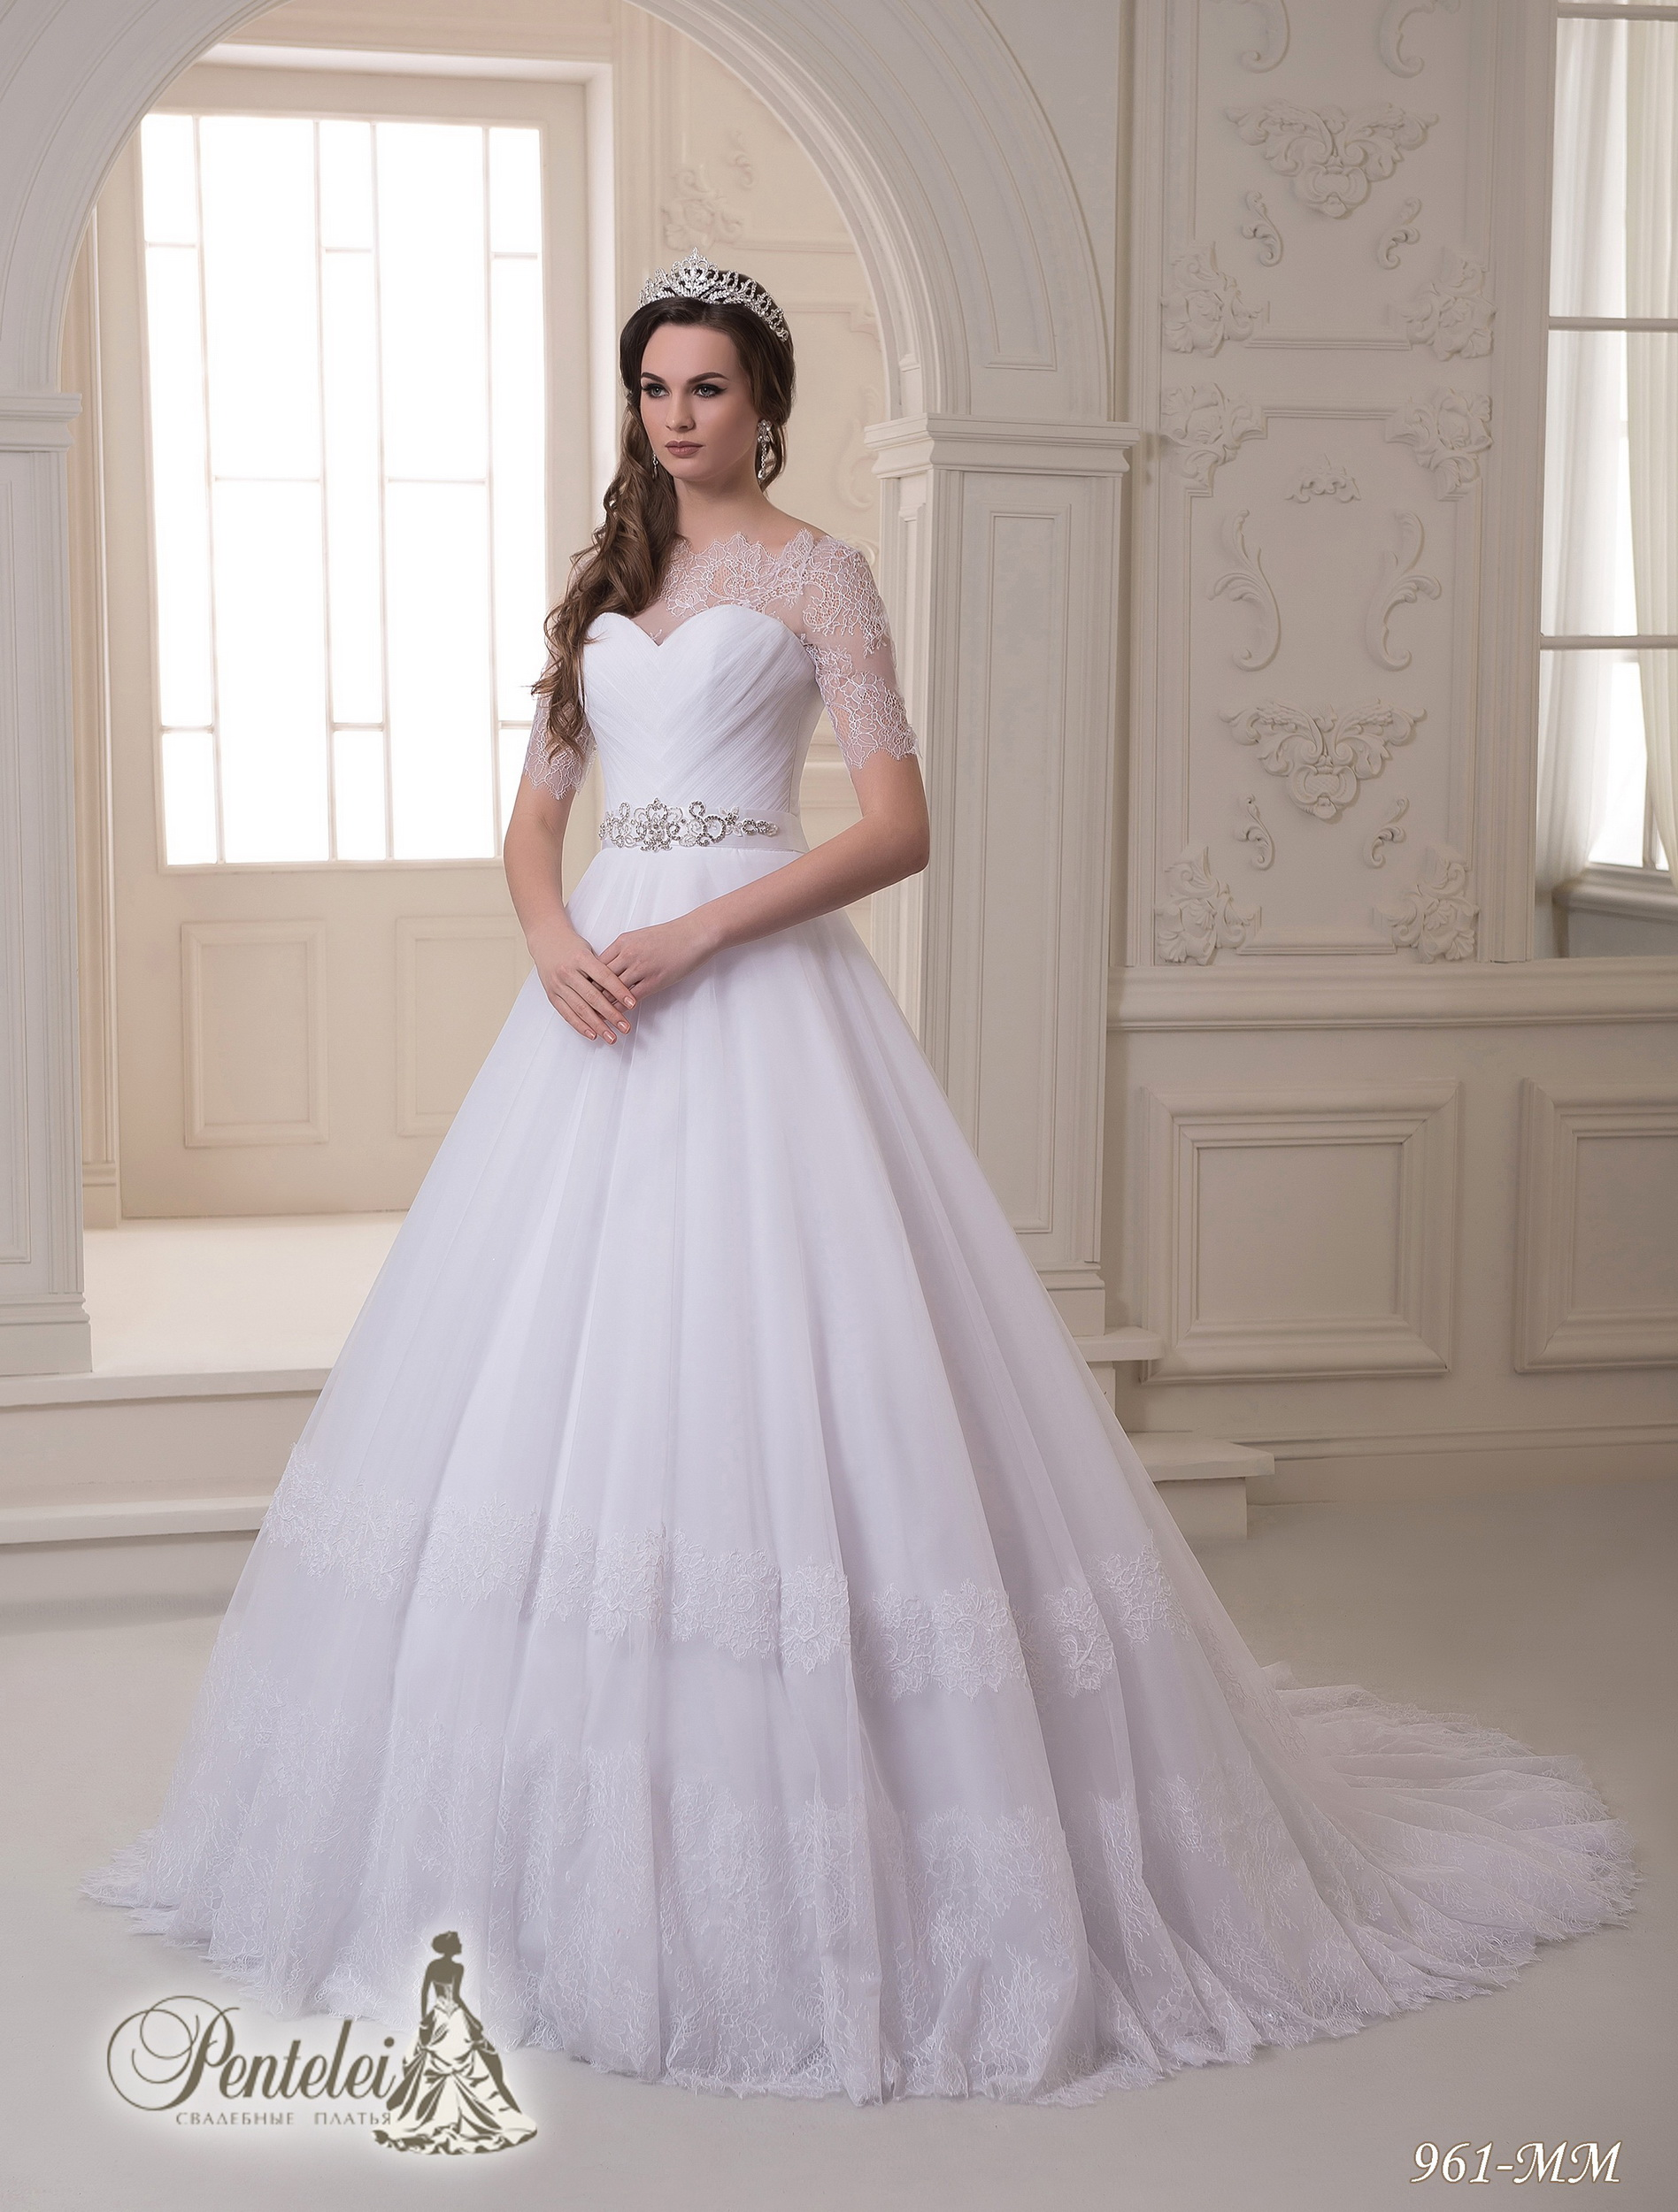 961-MM | Buy wedding dresses wholesale from Pentelei